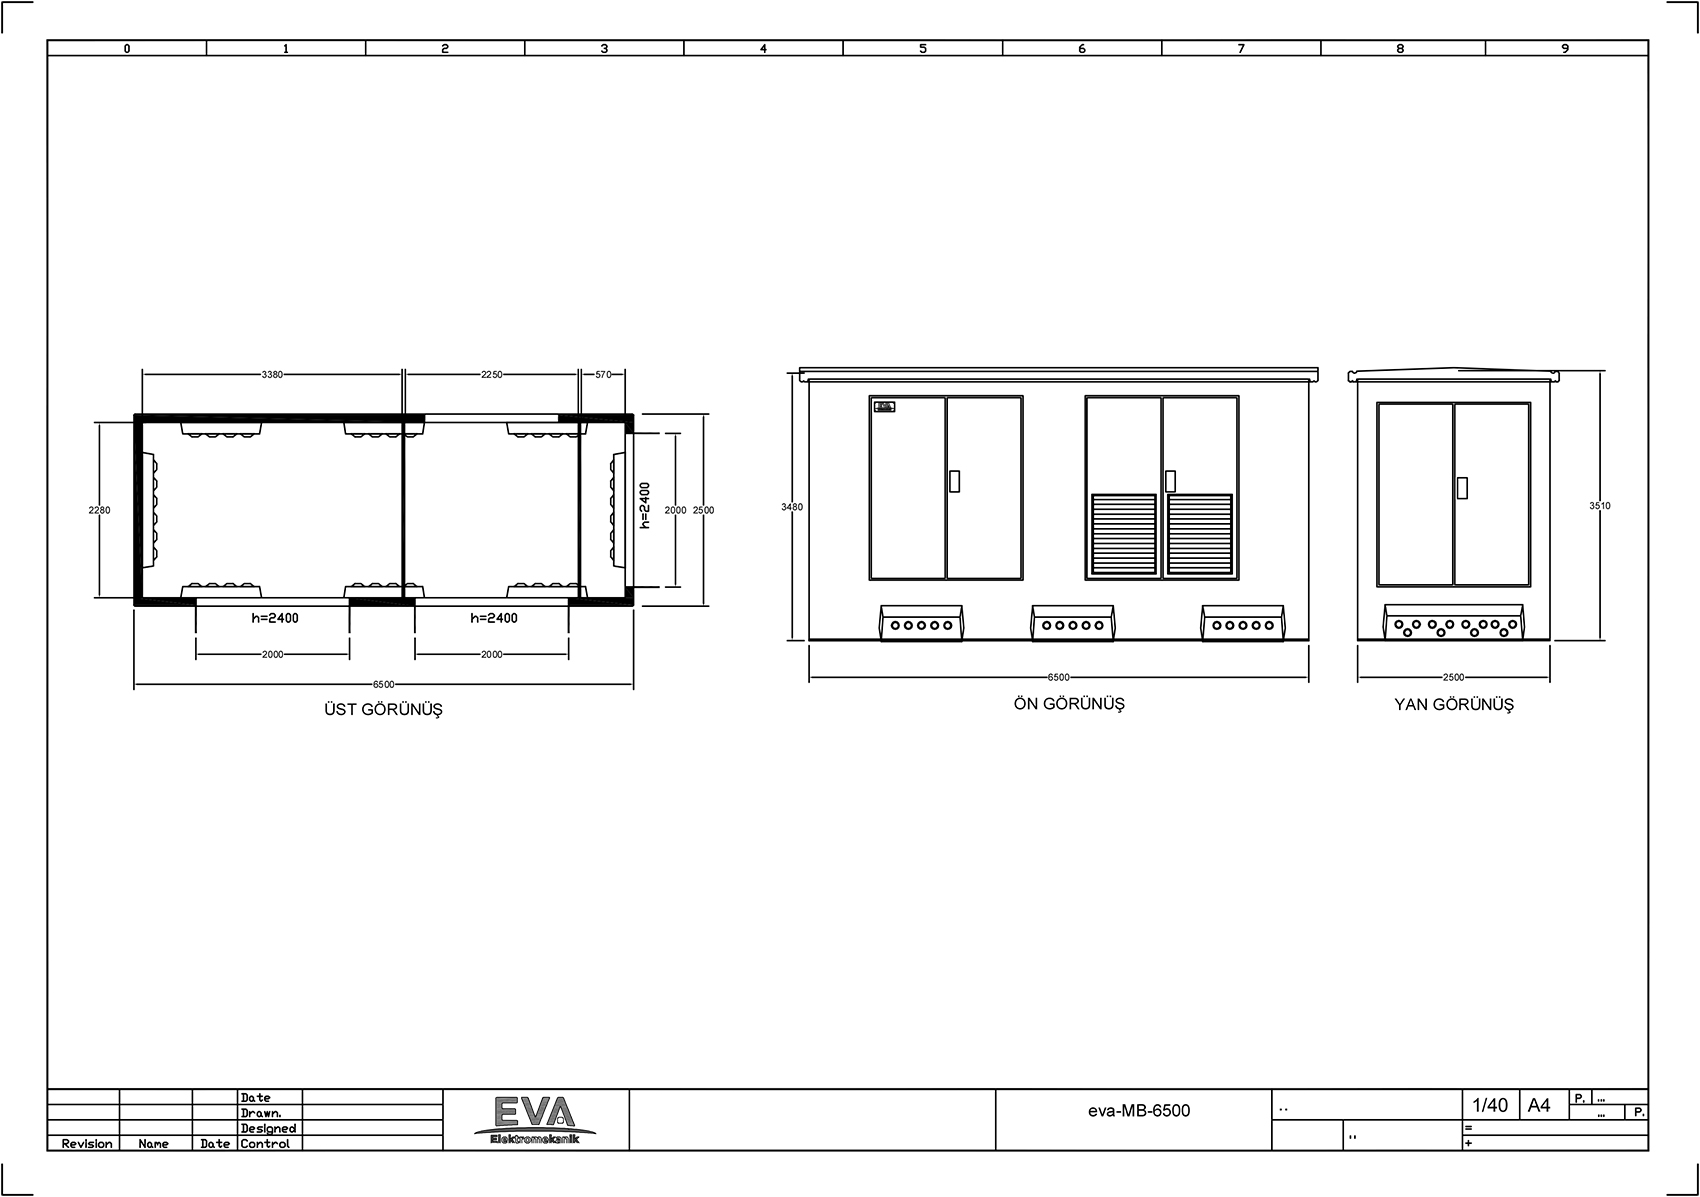 Monoblok Beton Köşk 6.500 x 2.500 x 3.530 mm